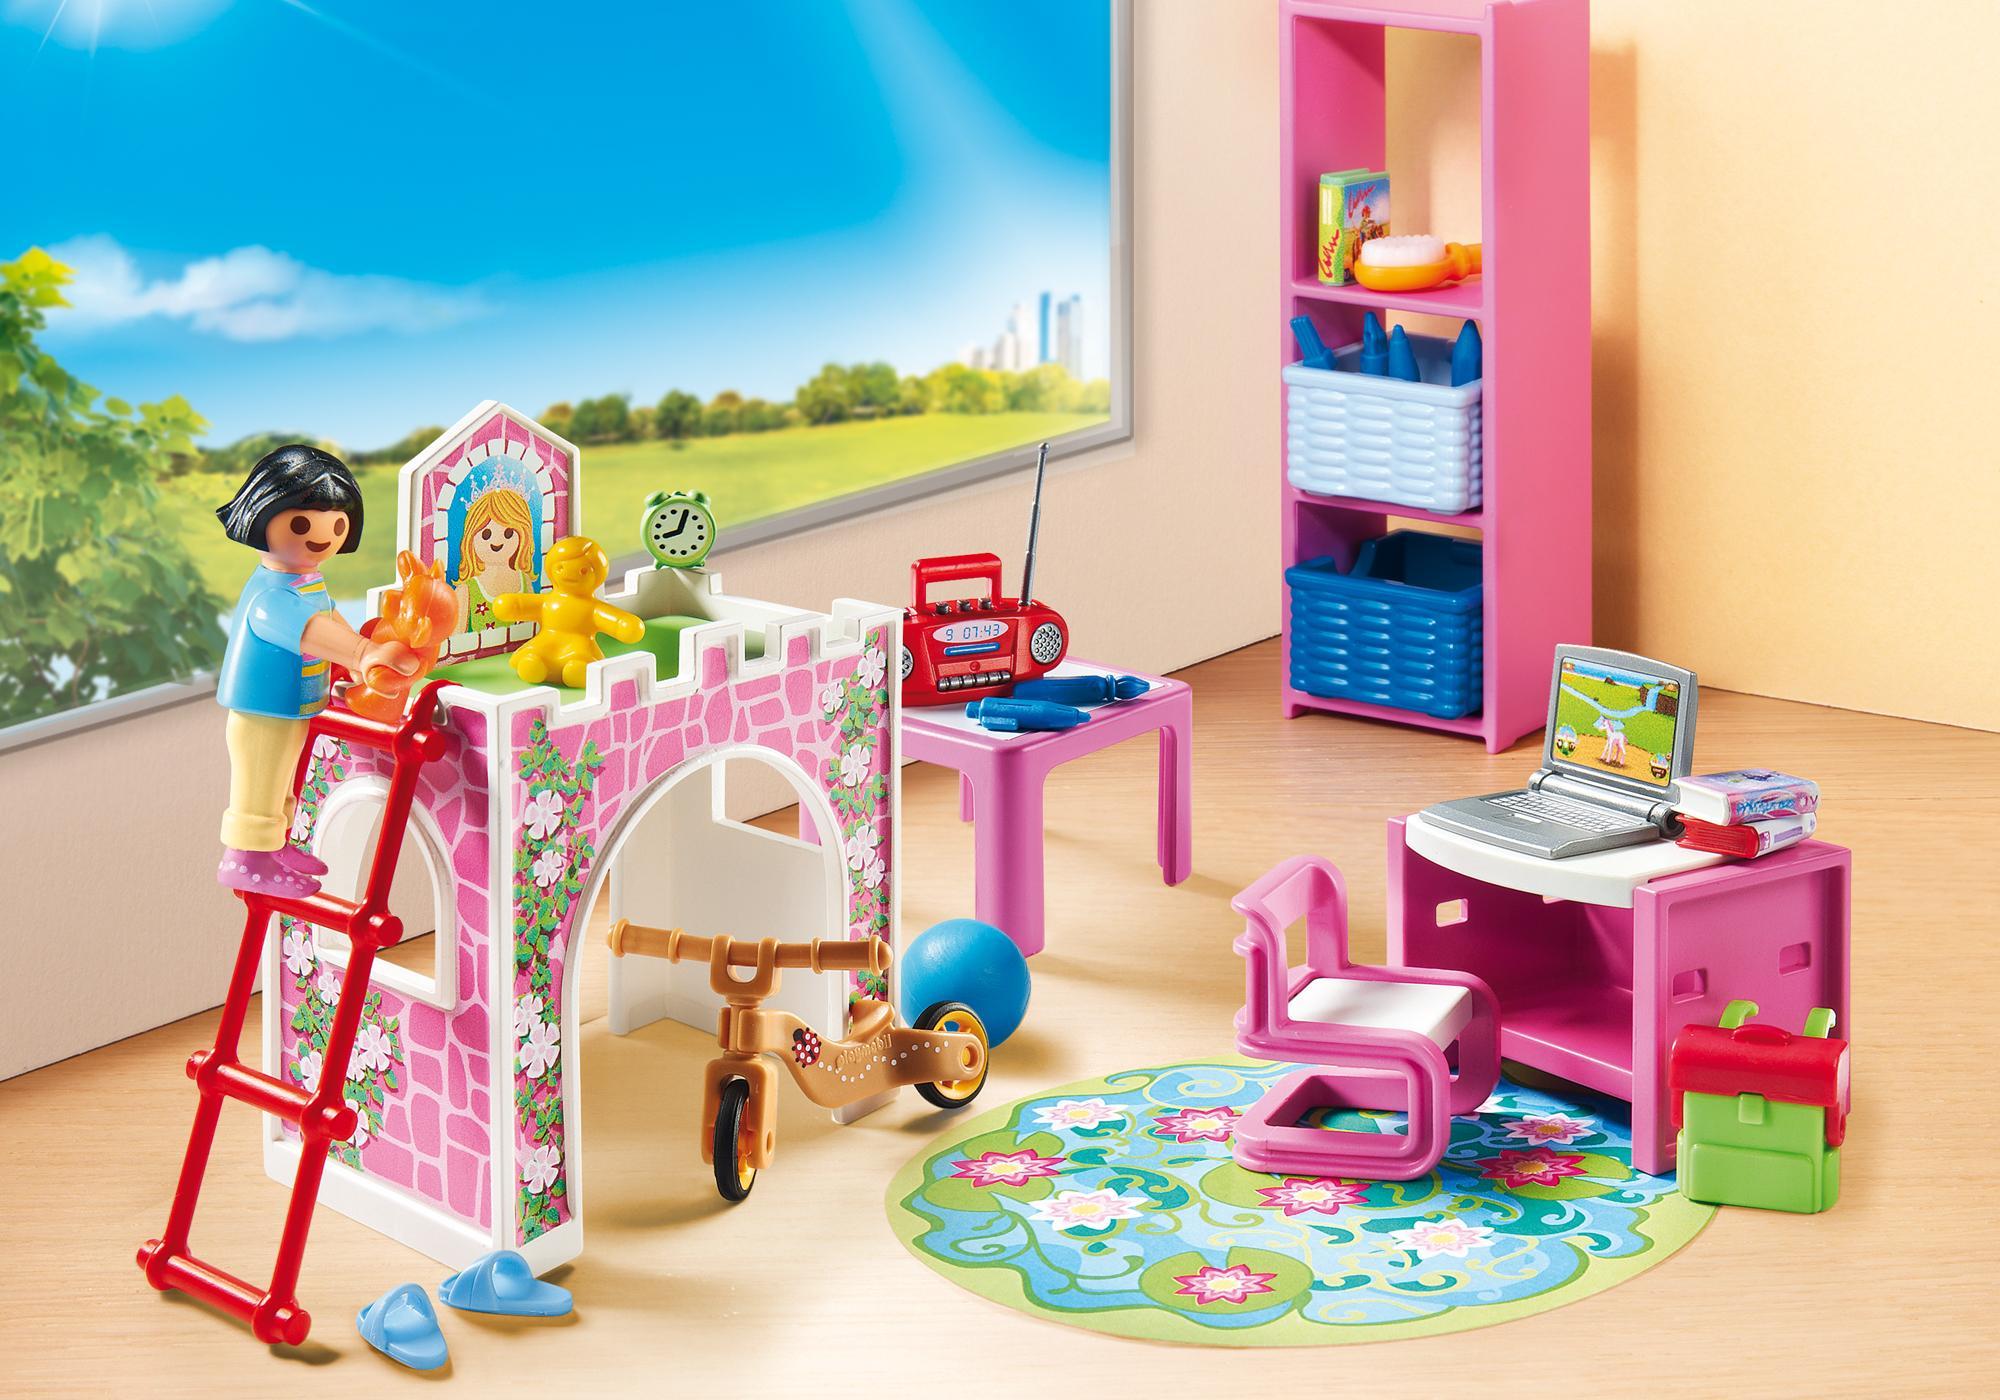 http://media.playmobil.com/i/playmobil/9270_product_detail/Chambre d'enfant